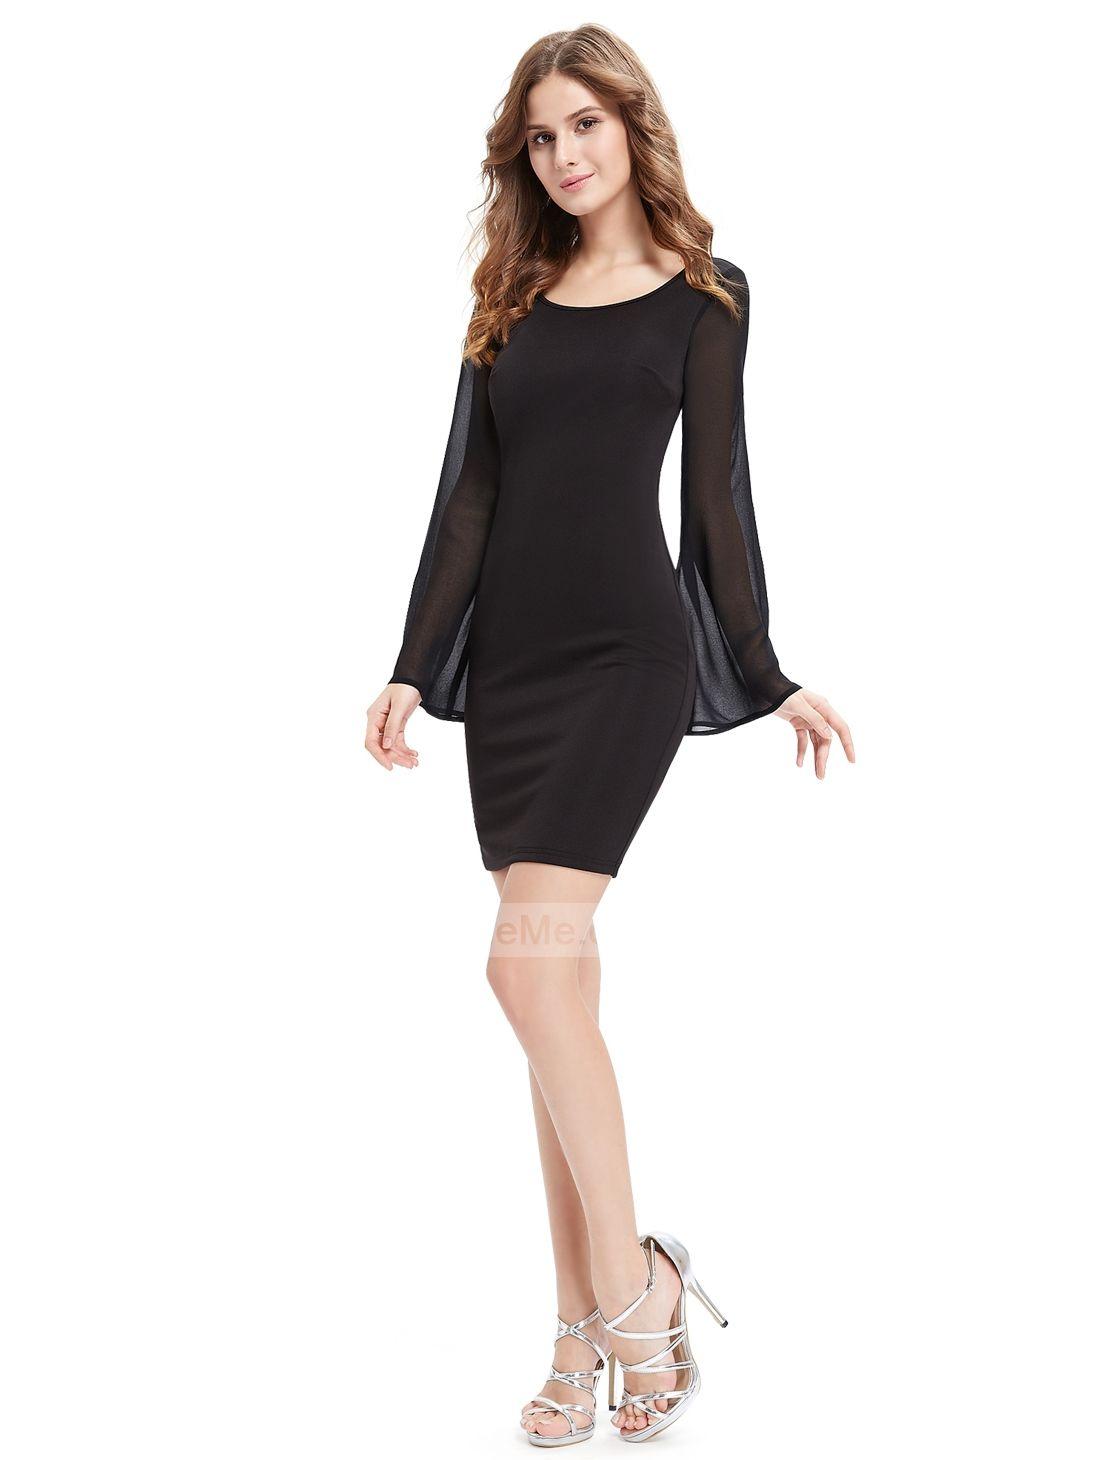 Simple Black Chiffon Long Sleeves Fitted Fashion Short Prom Dress Womens Sheath Dress Black Dress Fashion [ 1460 x 1095 Pixel ]